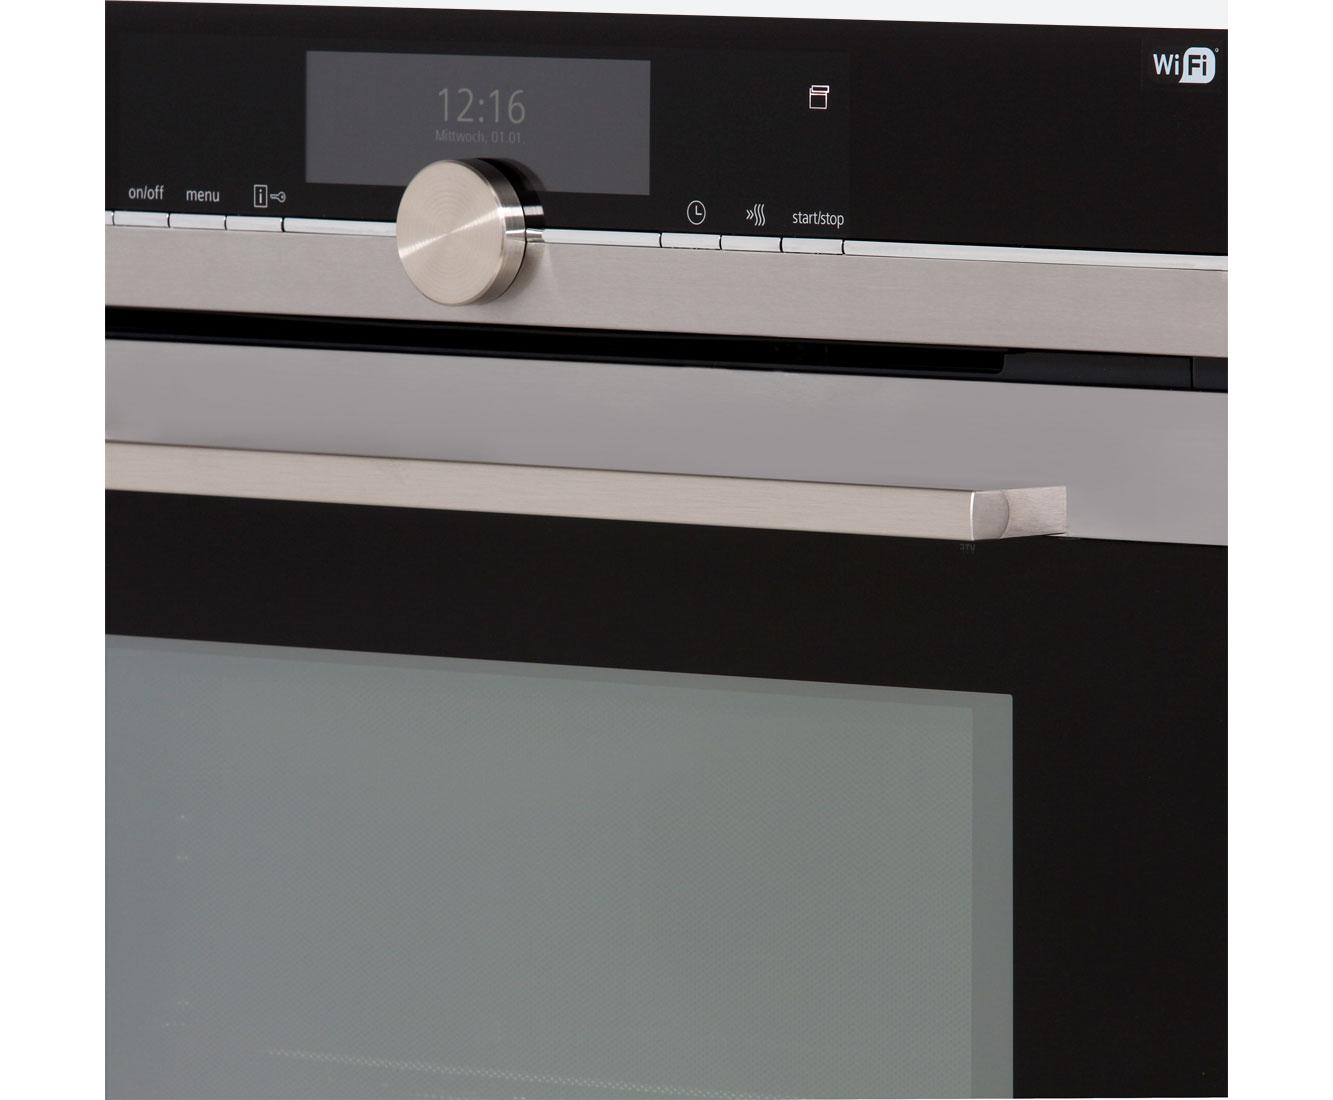 siemens induktionskochfeld wifi comfee cci 21 fs induktionskochfeld zum g nstigen preis kaufen. Black Bedroom Furniture Sets. Home Design Ideas